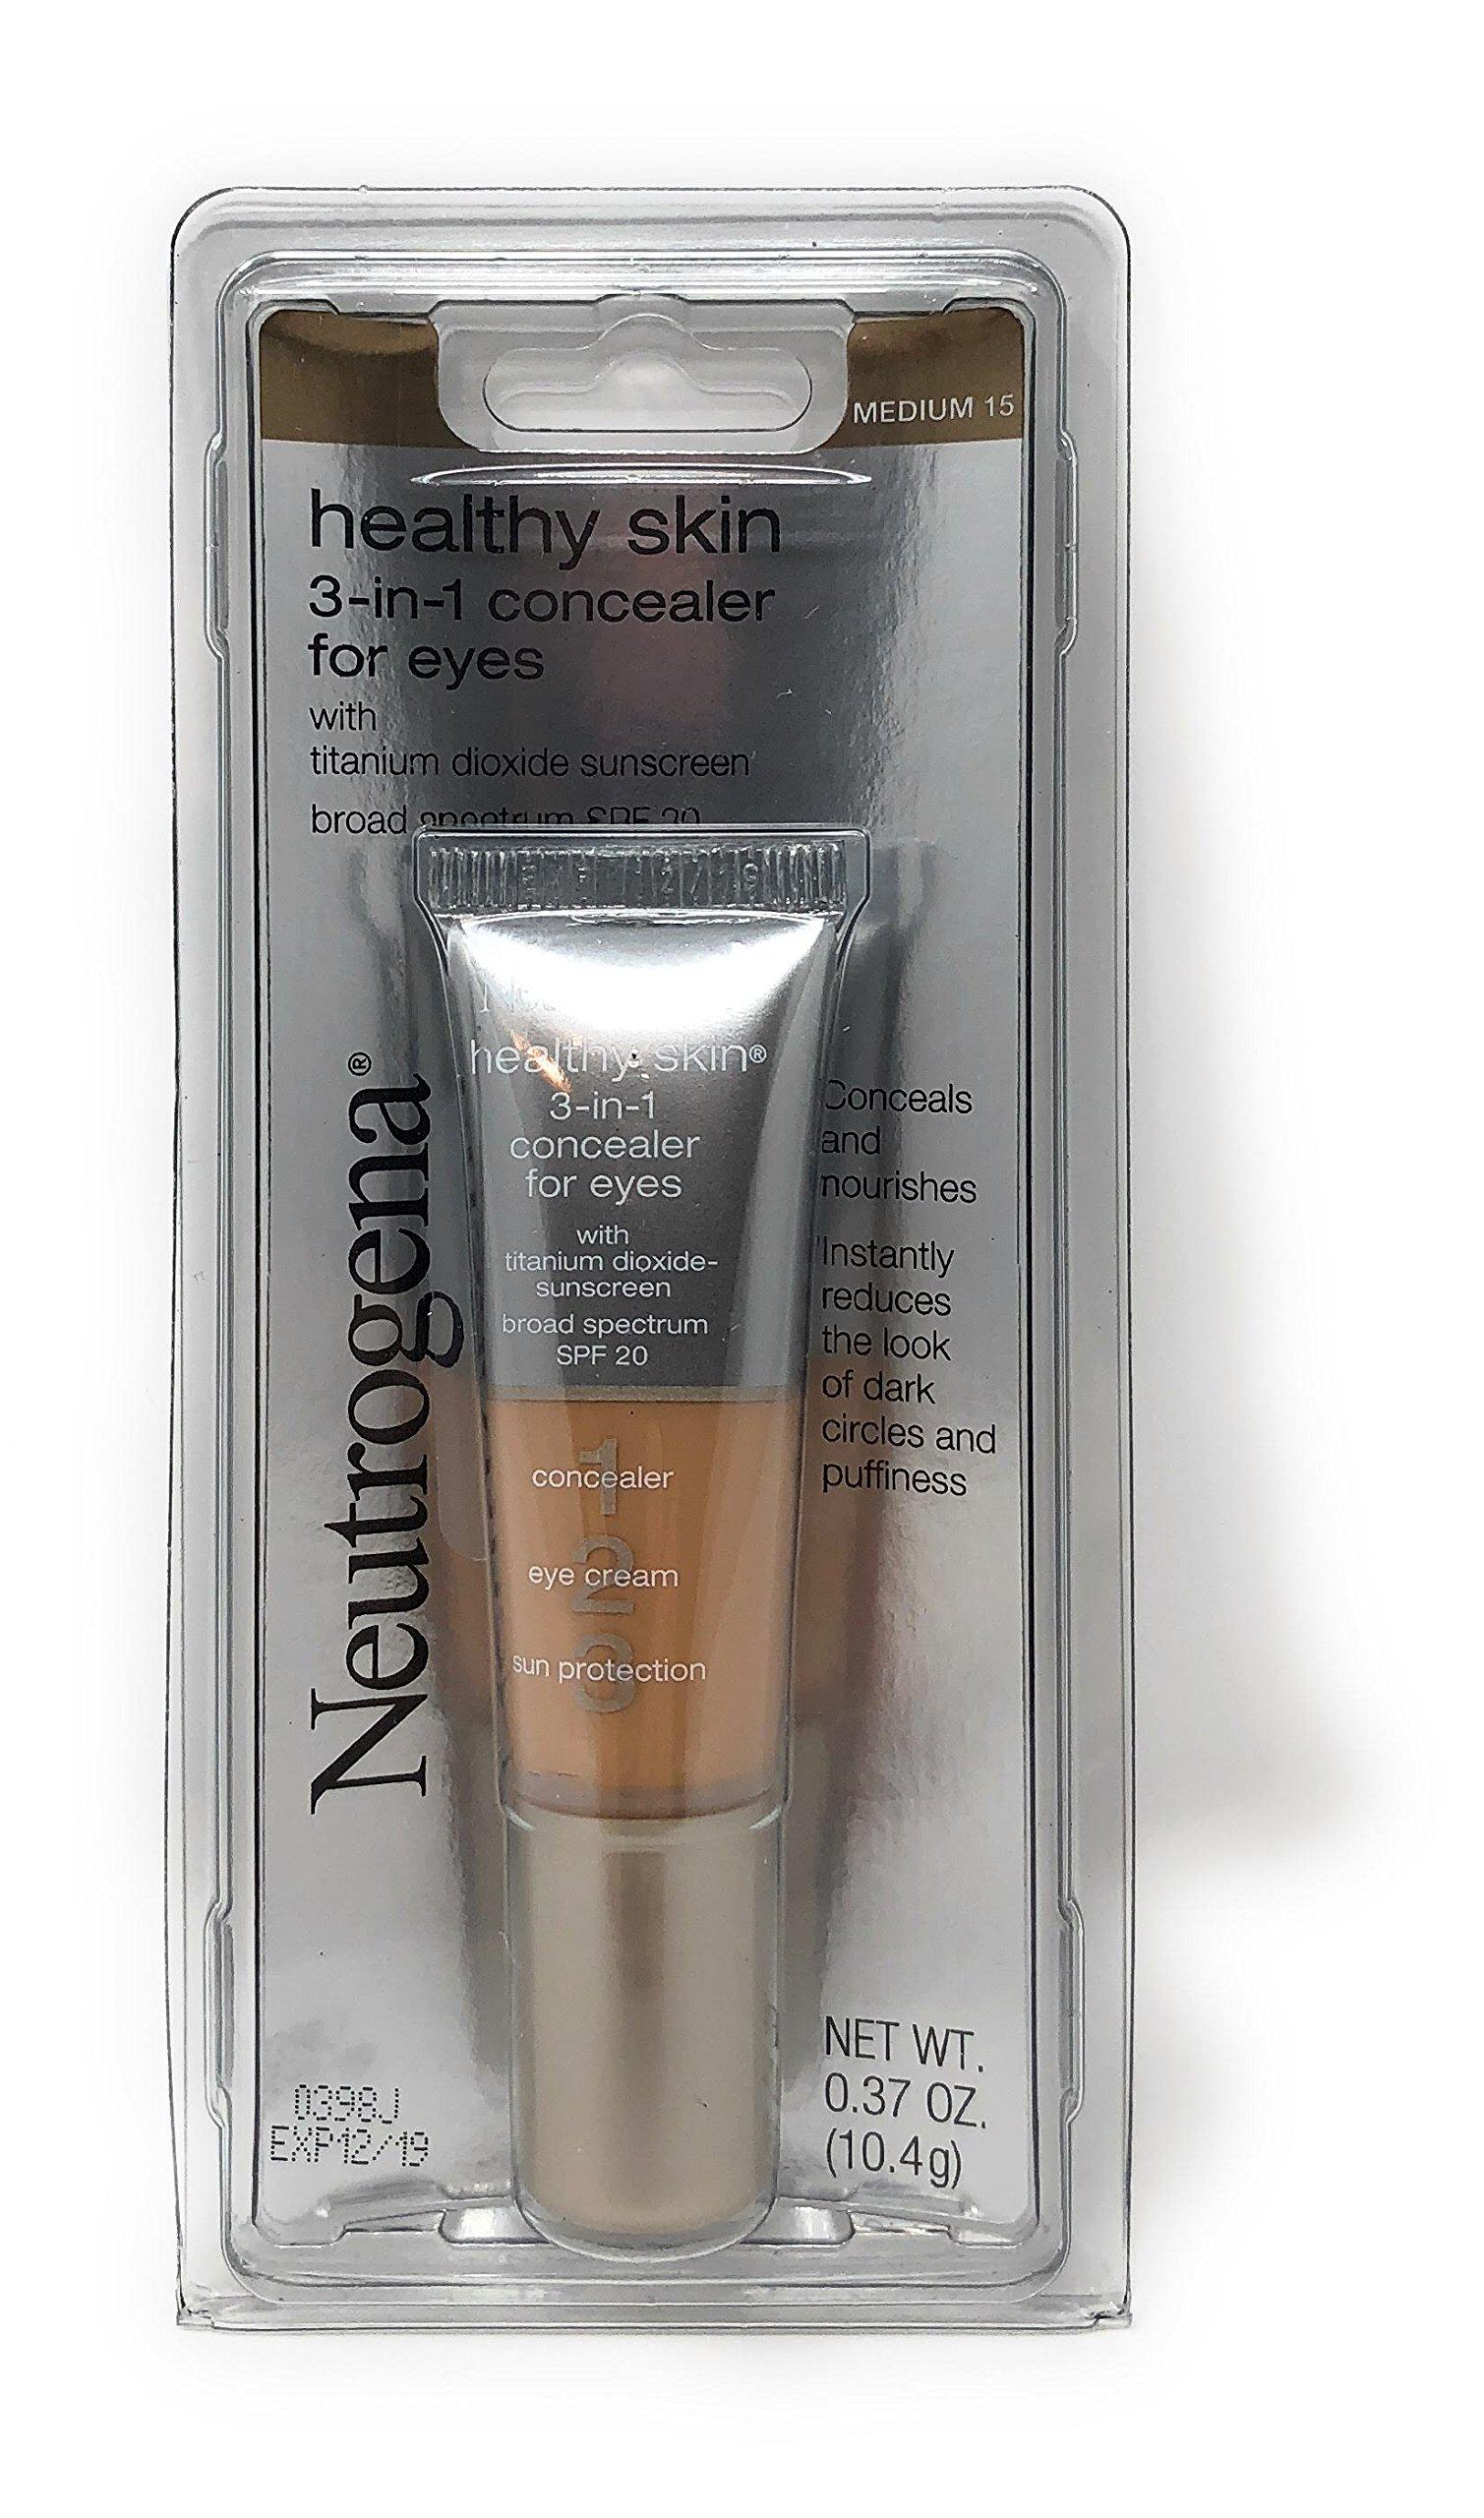 Neutrogena 3-in-1 Concealer for Eyes, Medium [15], 0.37 oz